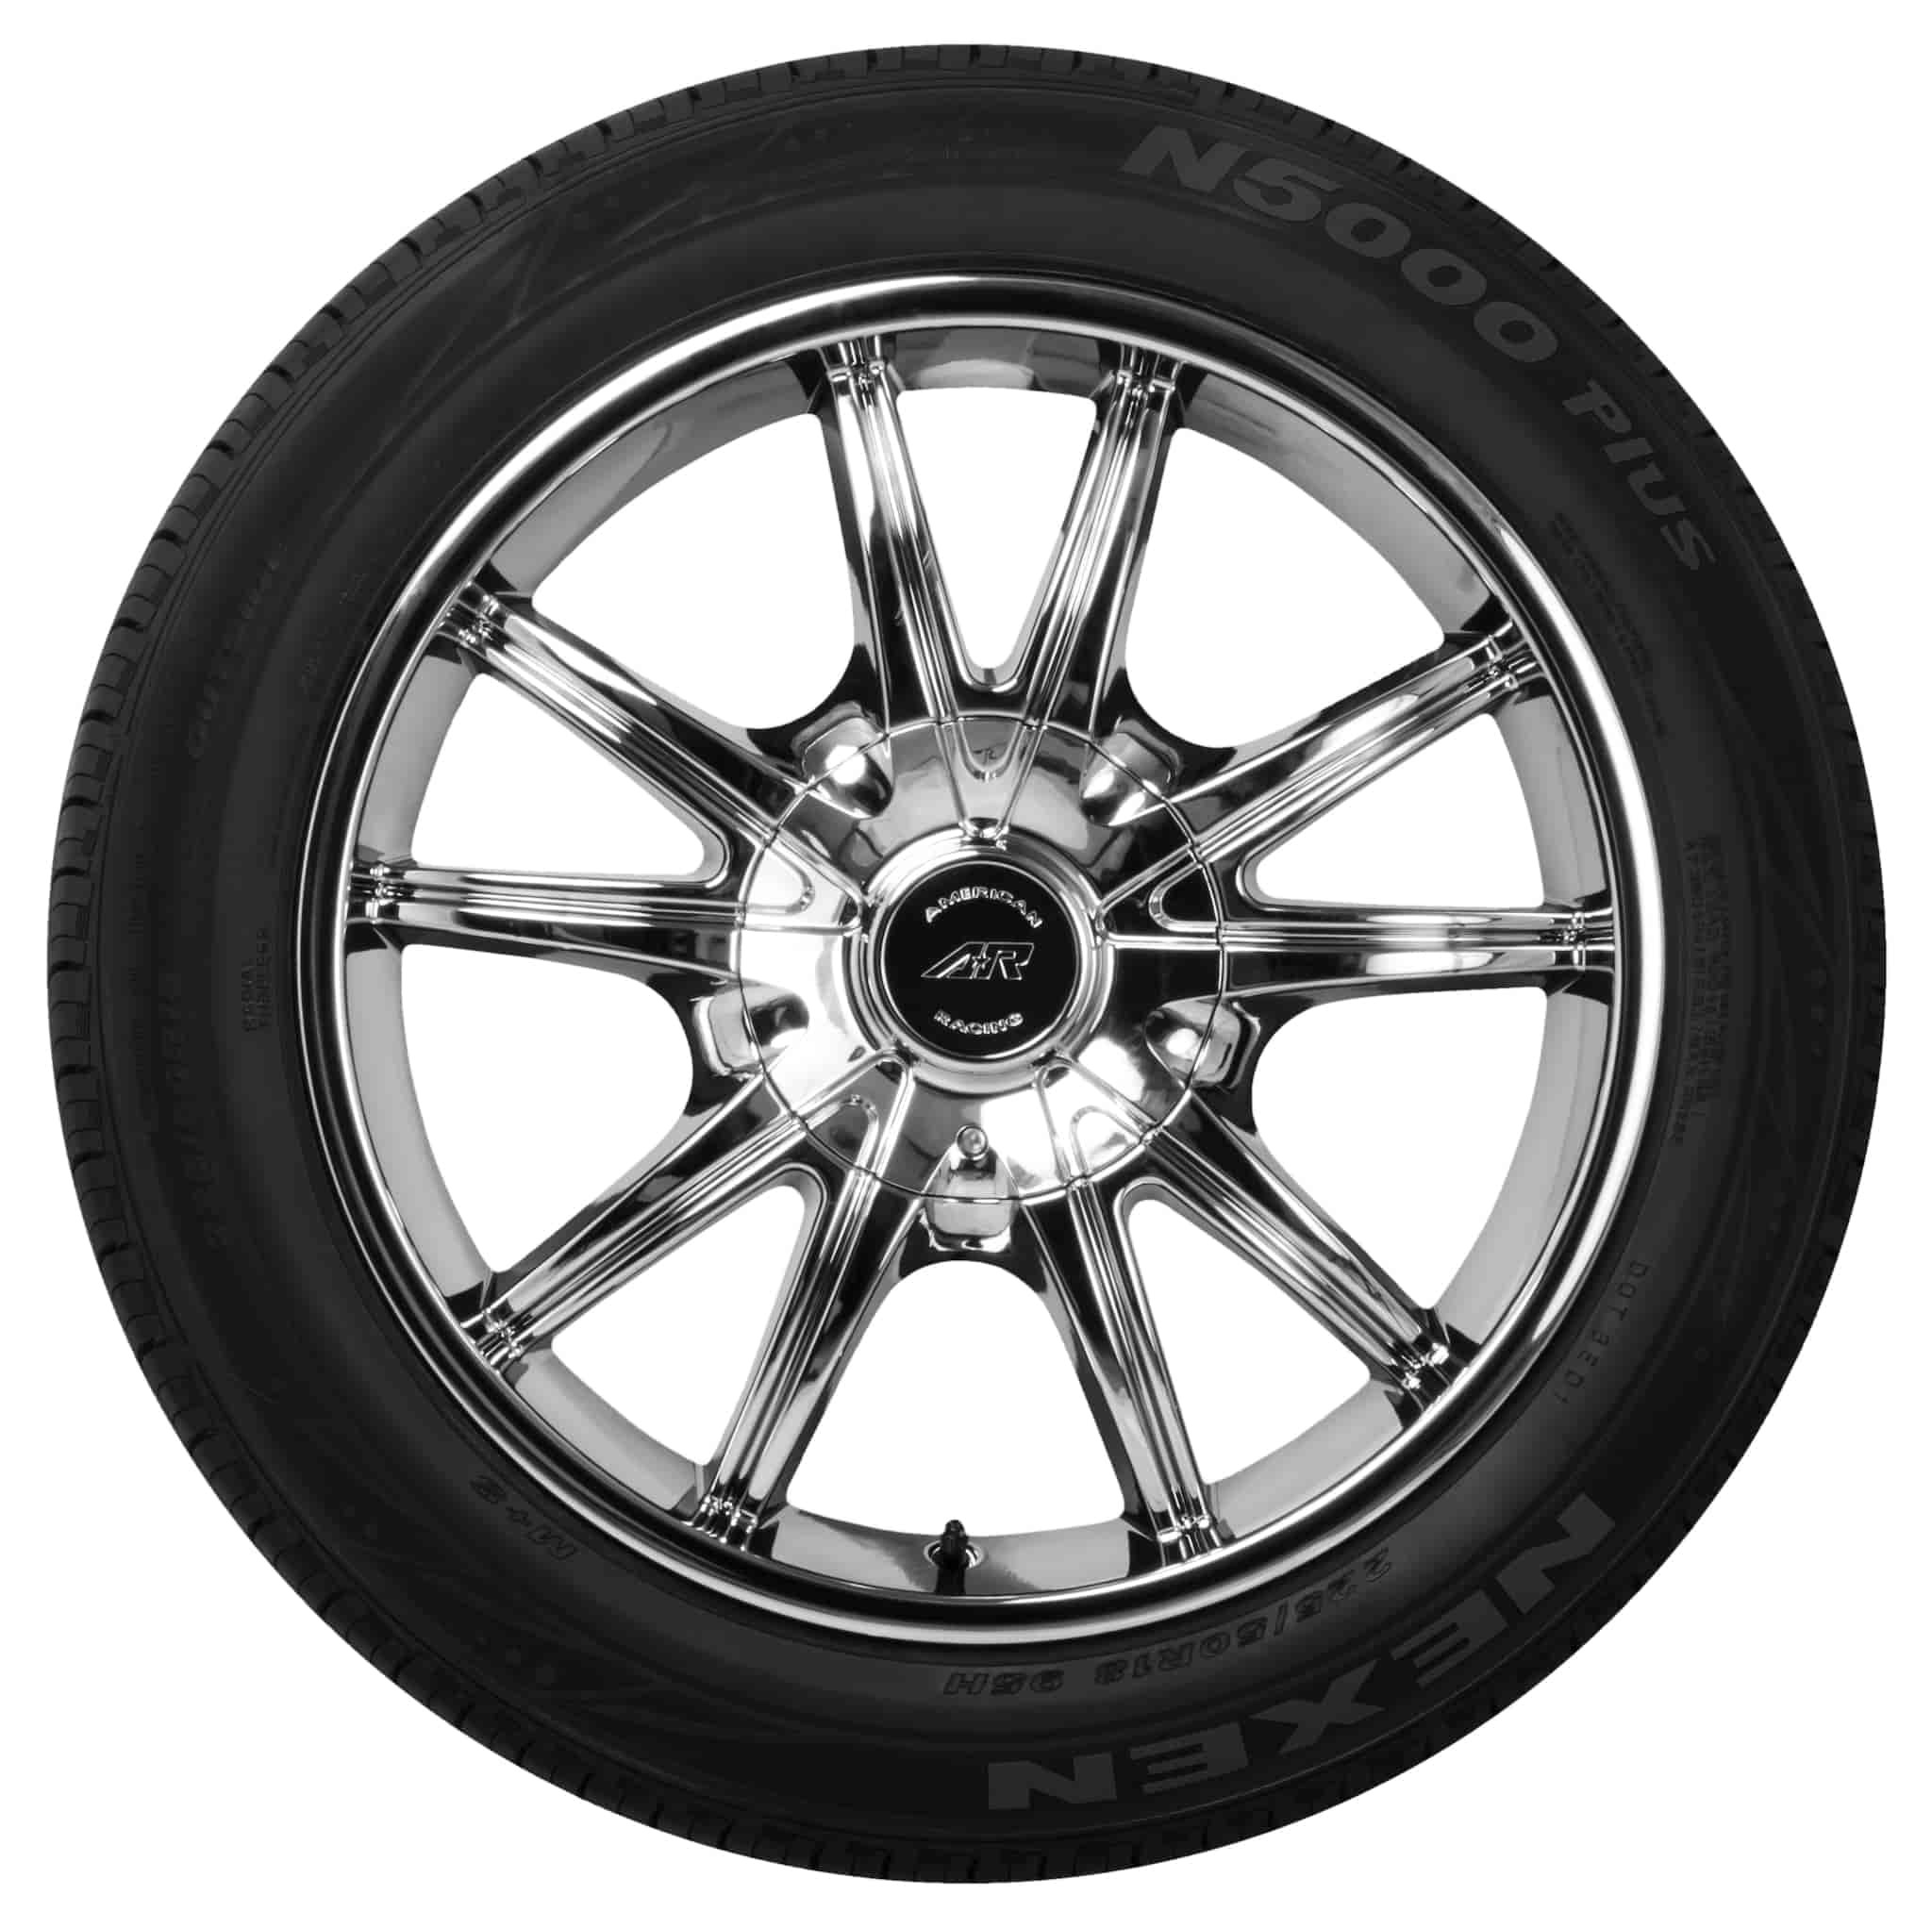 buy nexen n 5000 tubeless tyre 205 65 r15 92h features price Renault R15 nexen n 5000 tubeless tyre 205 65 r15 92h